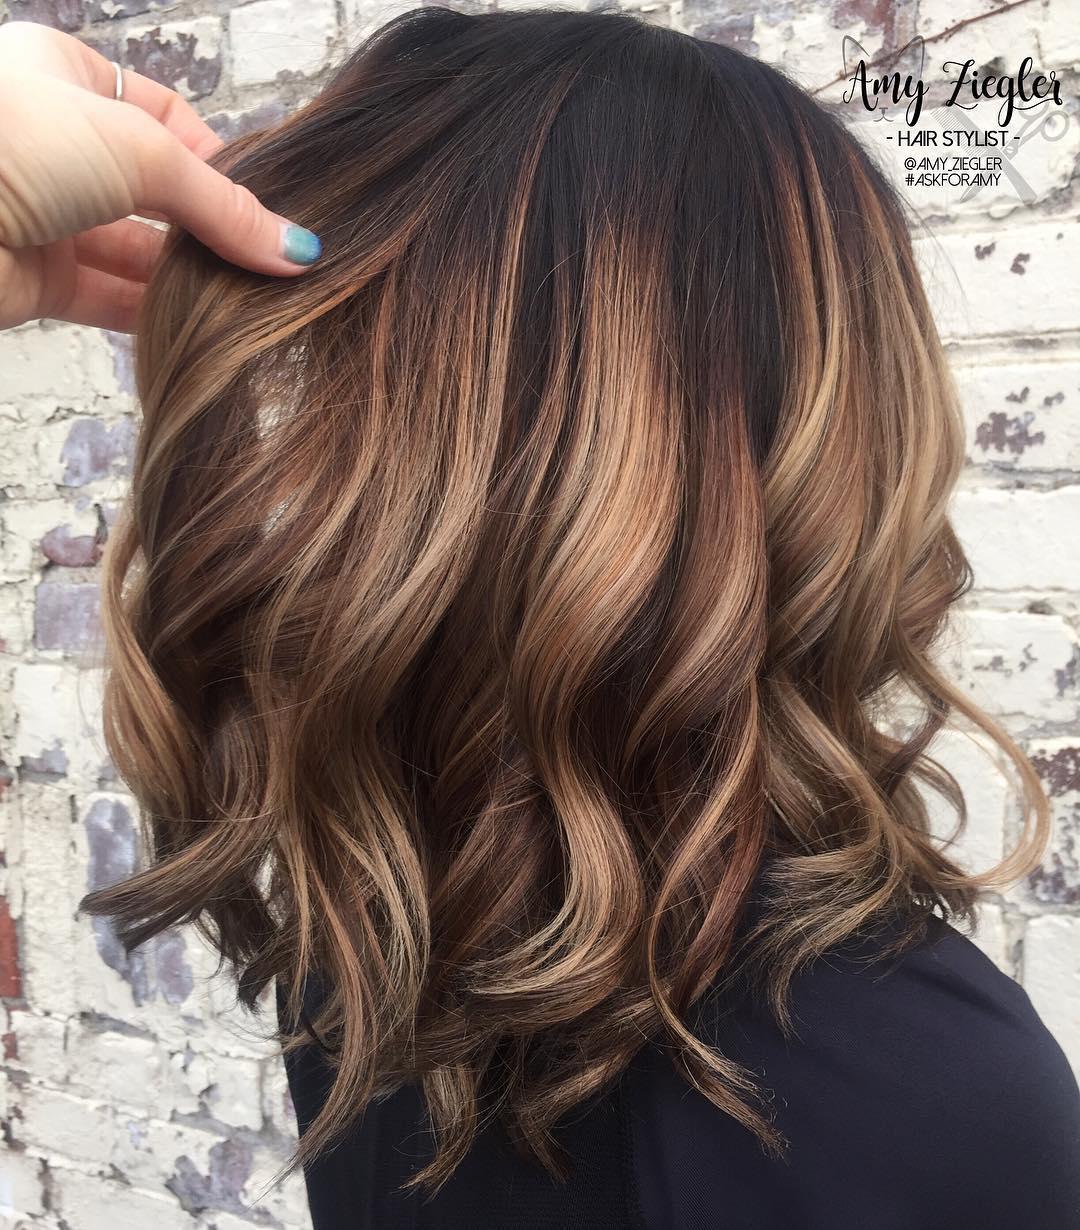 50 Astonishing Chocolate Brown Hair Ideas for 2020 , Hair